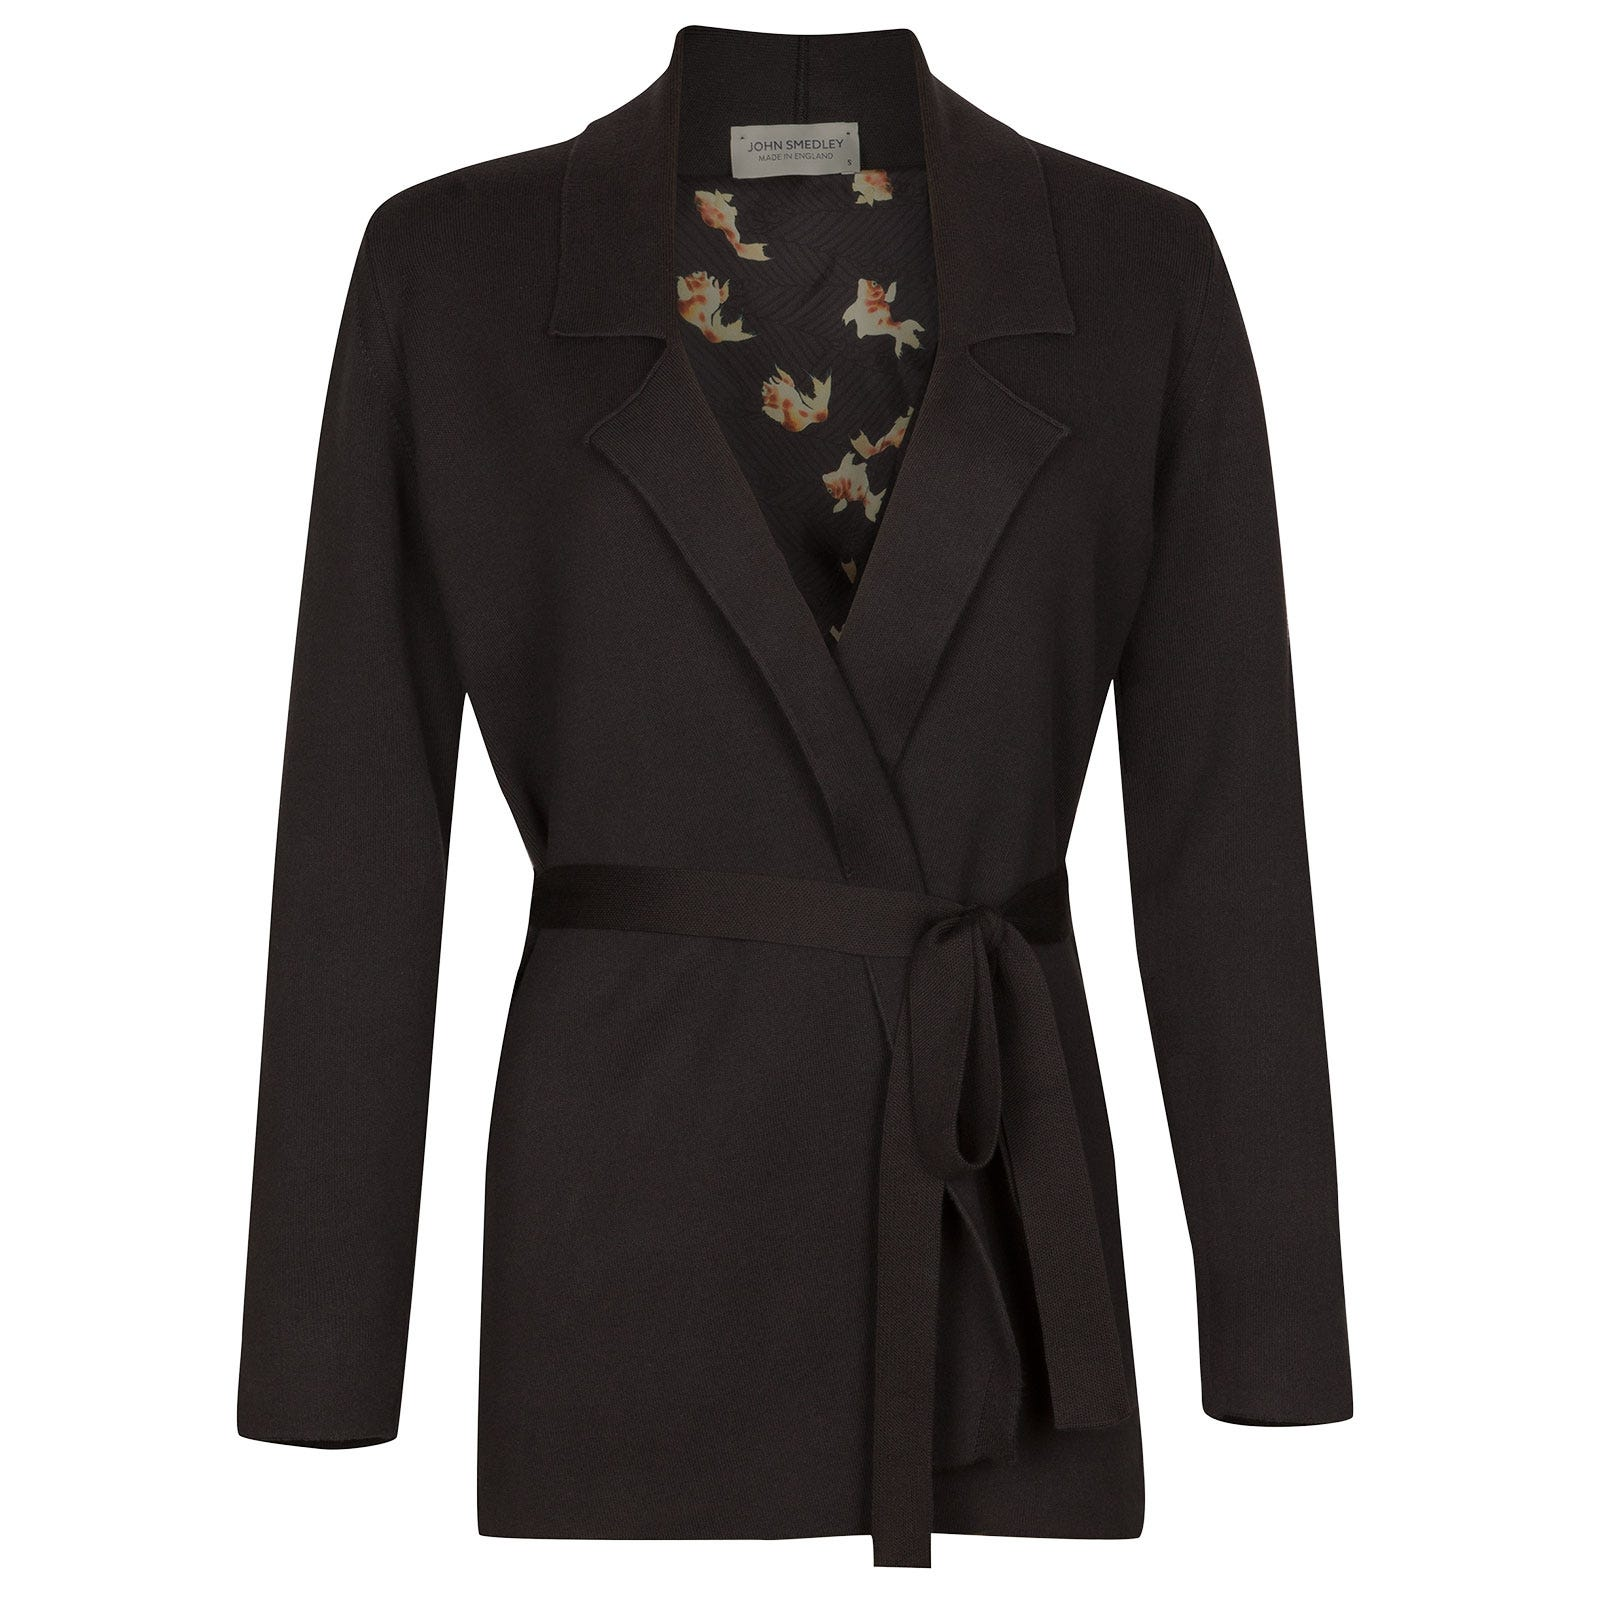 John Smedley Mitford Sea Island Cotton Jacket in Flannel Grey-SML